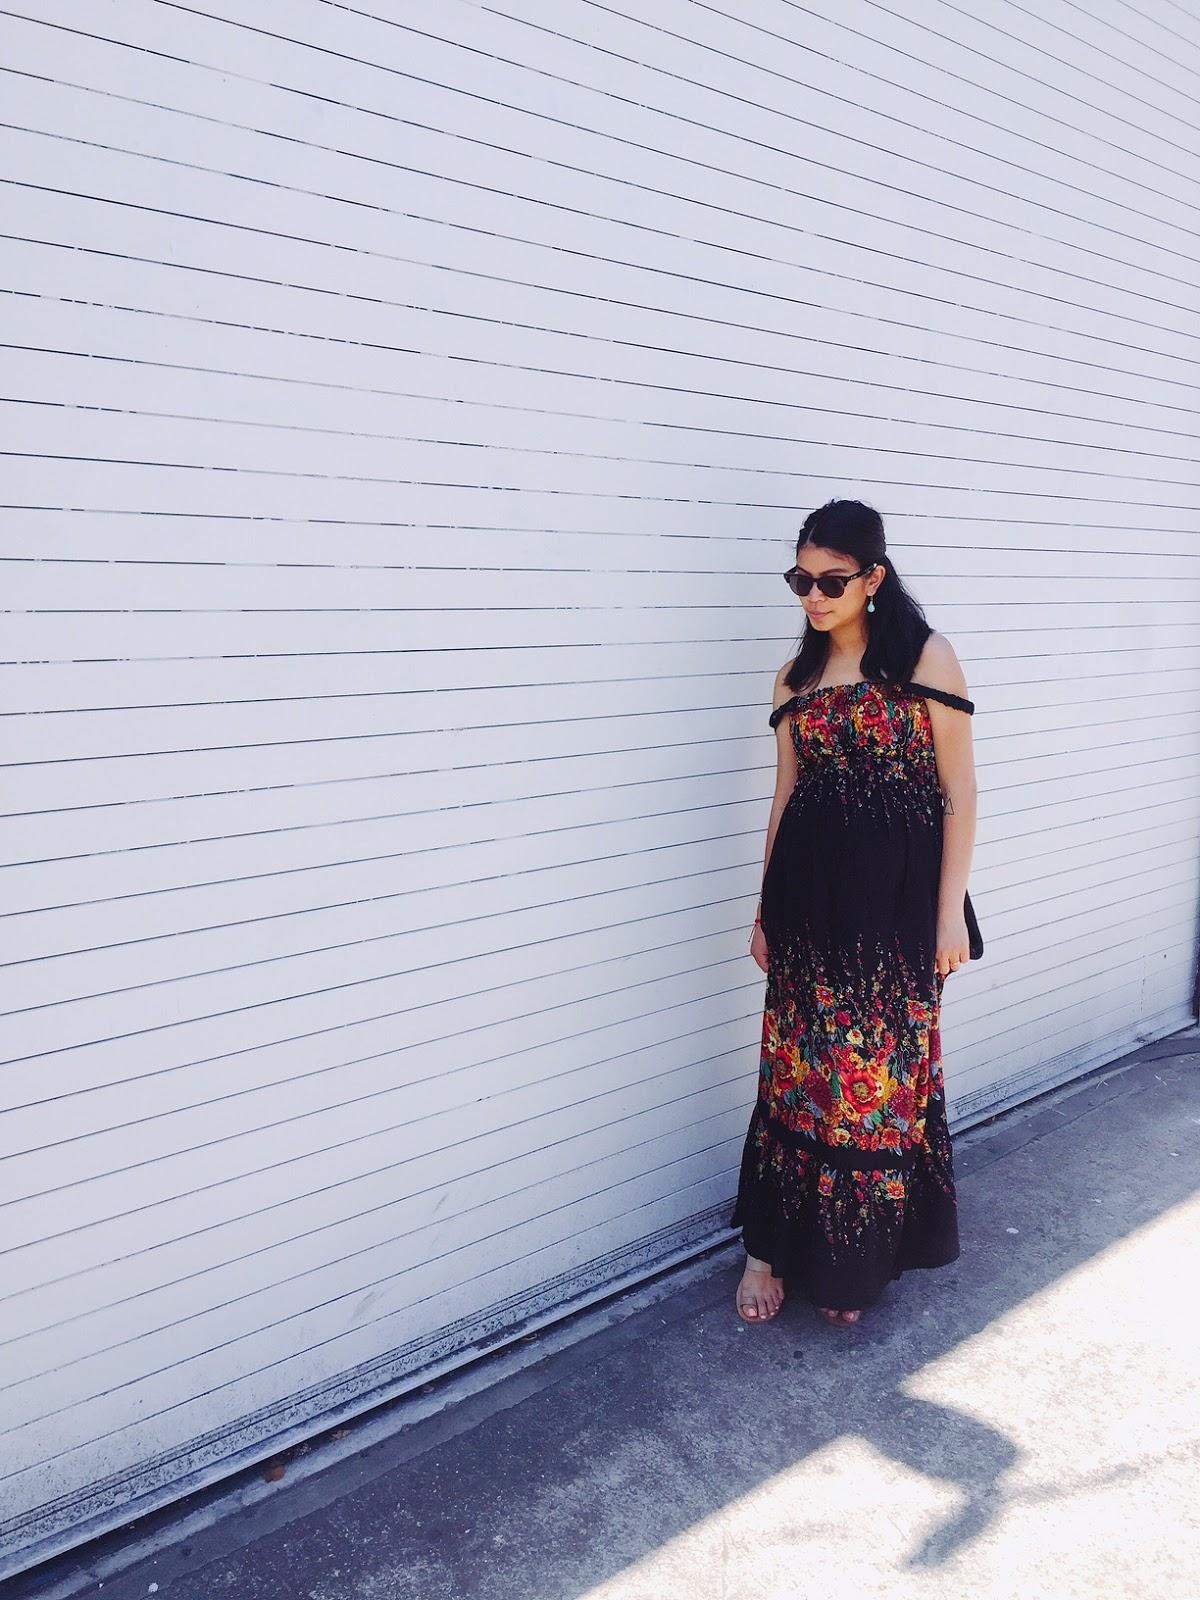 black floral dress, maxi dress, floral, fashion blogger, portland fashion blogger, fblogger, summer 2016, lifestyle blogger, portland fashion,